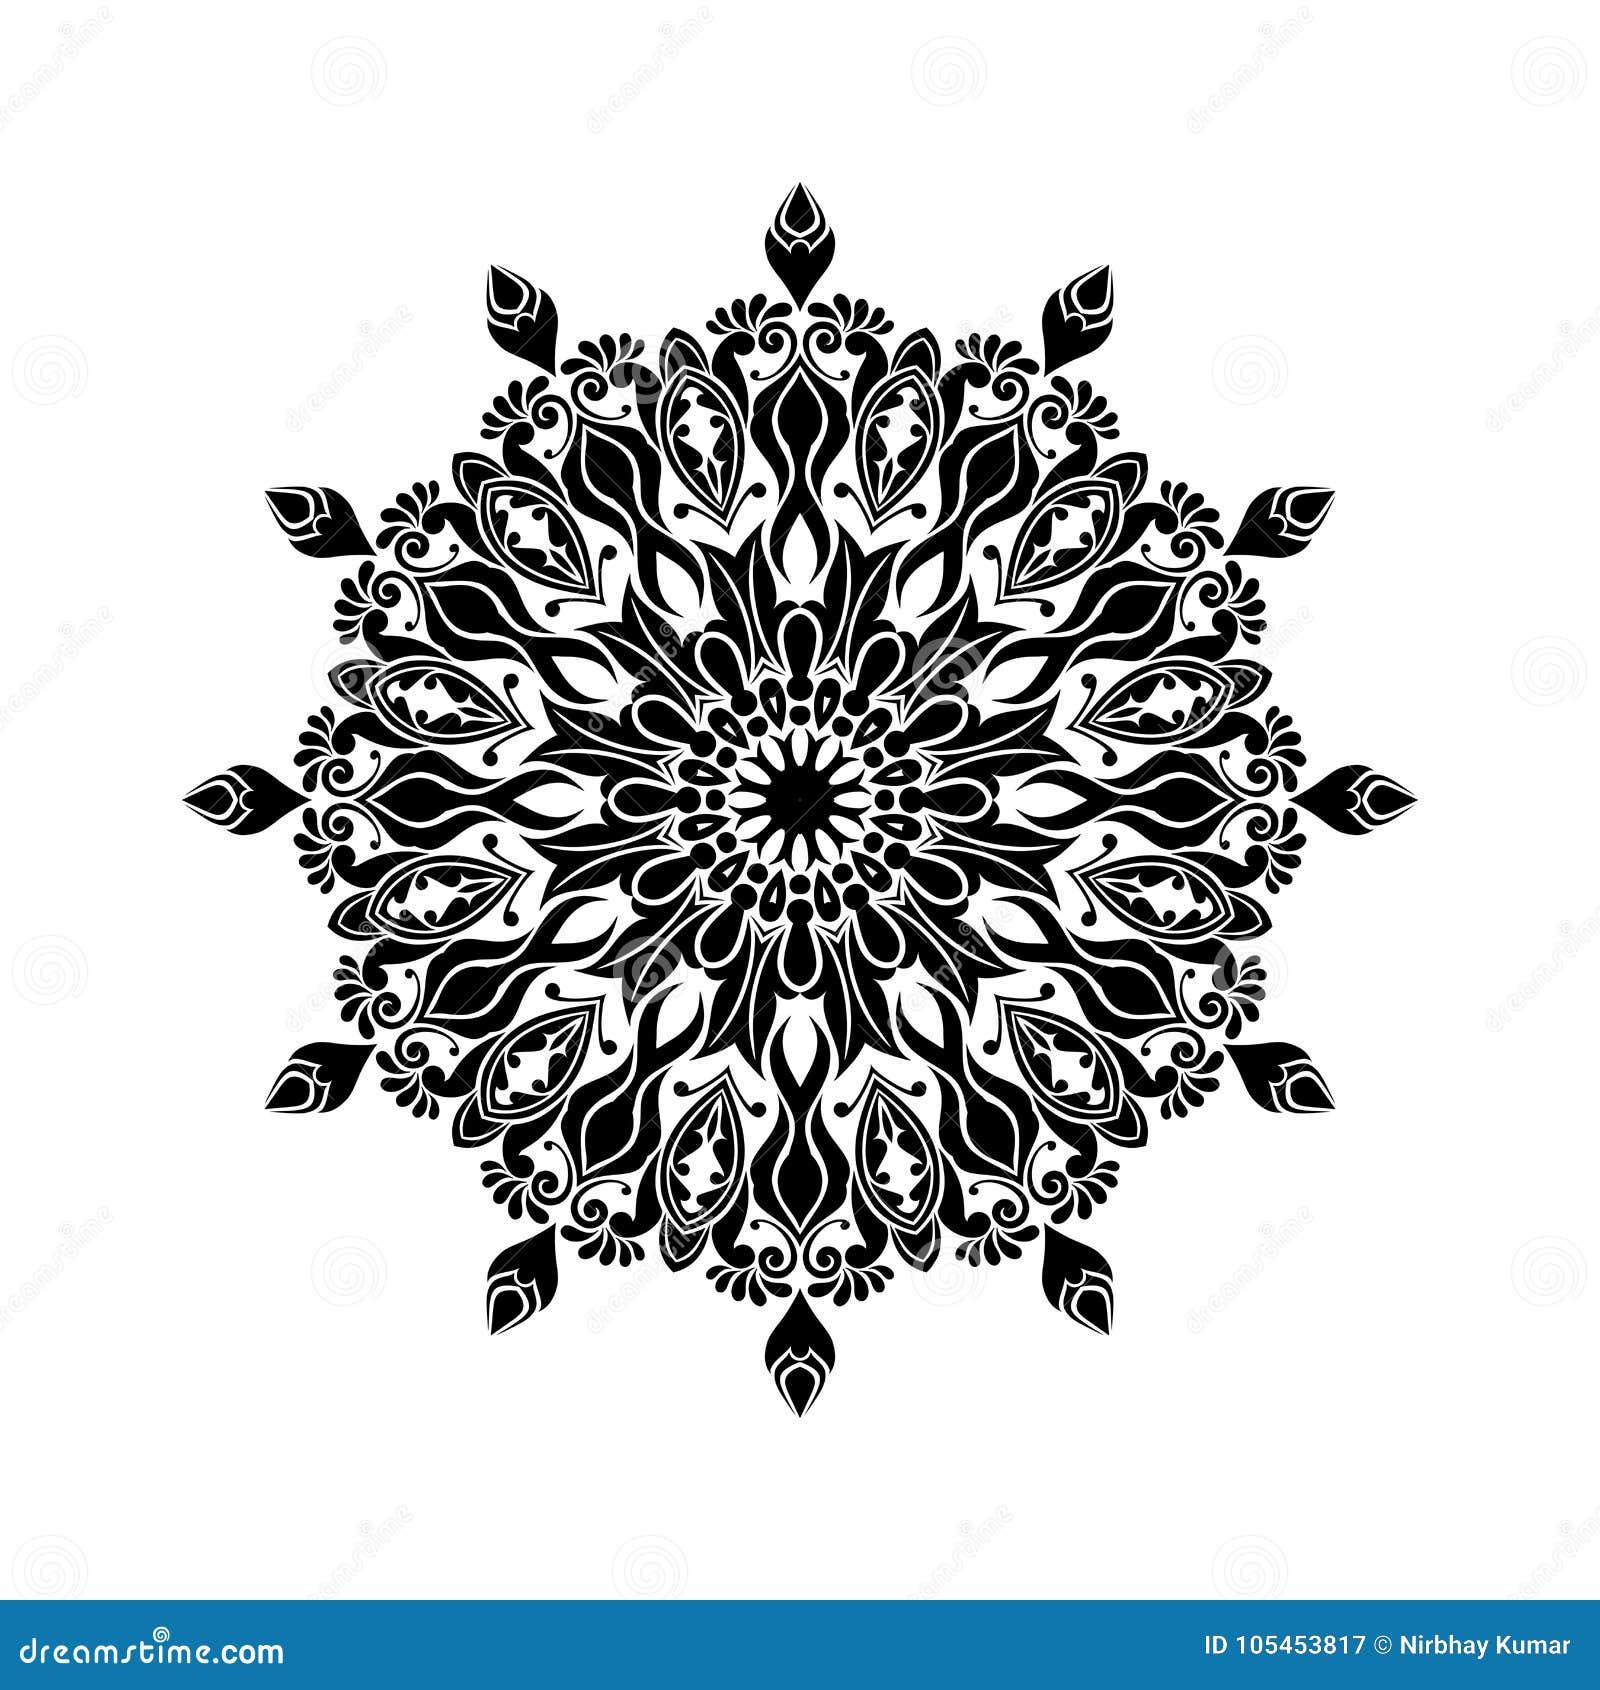 Vintage Mandala Design A L Arriere Plan Blanc Illustration De Vecteur Illustration Du Design Mandala 105453817